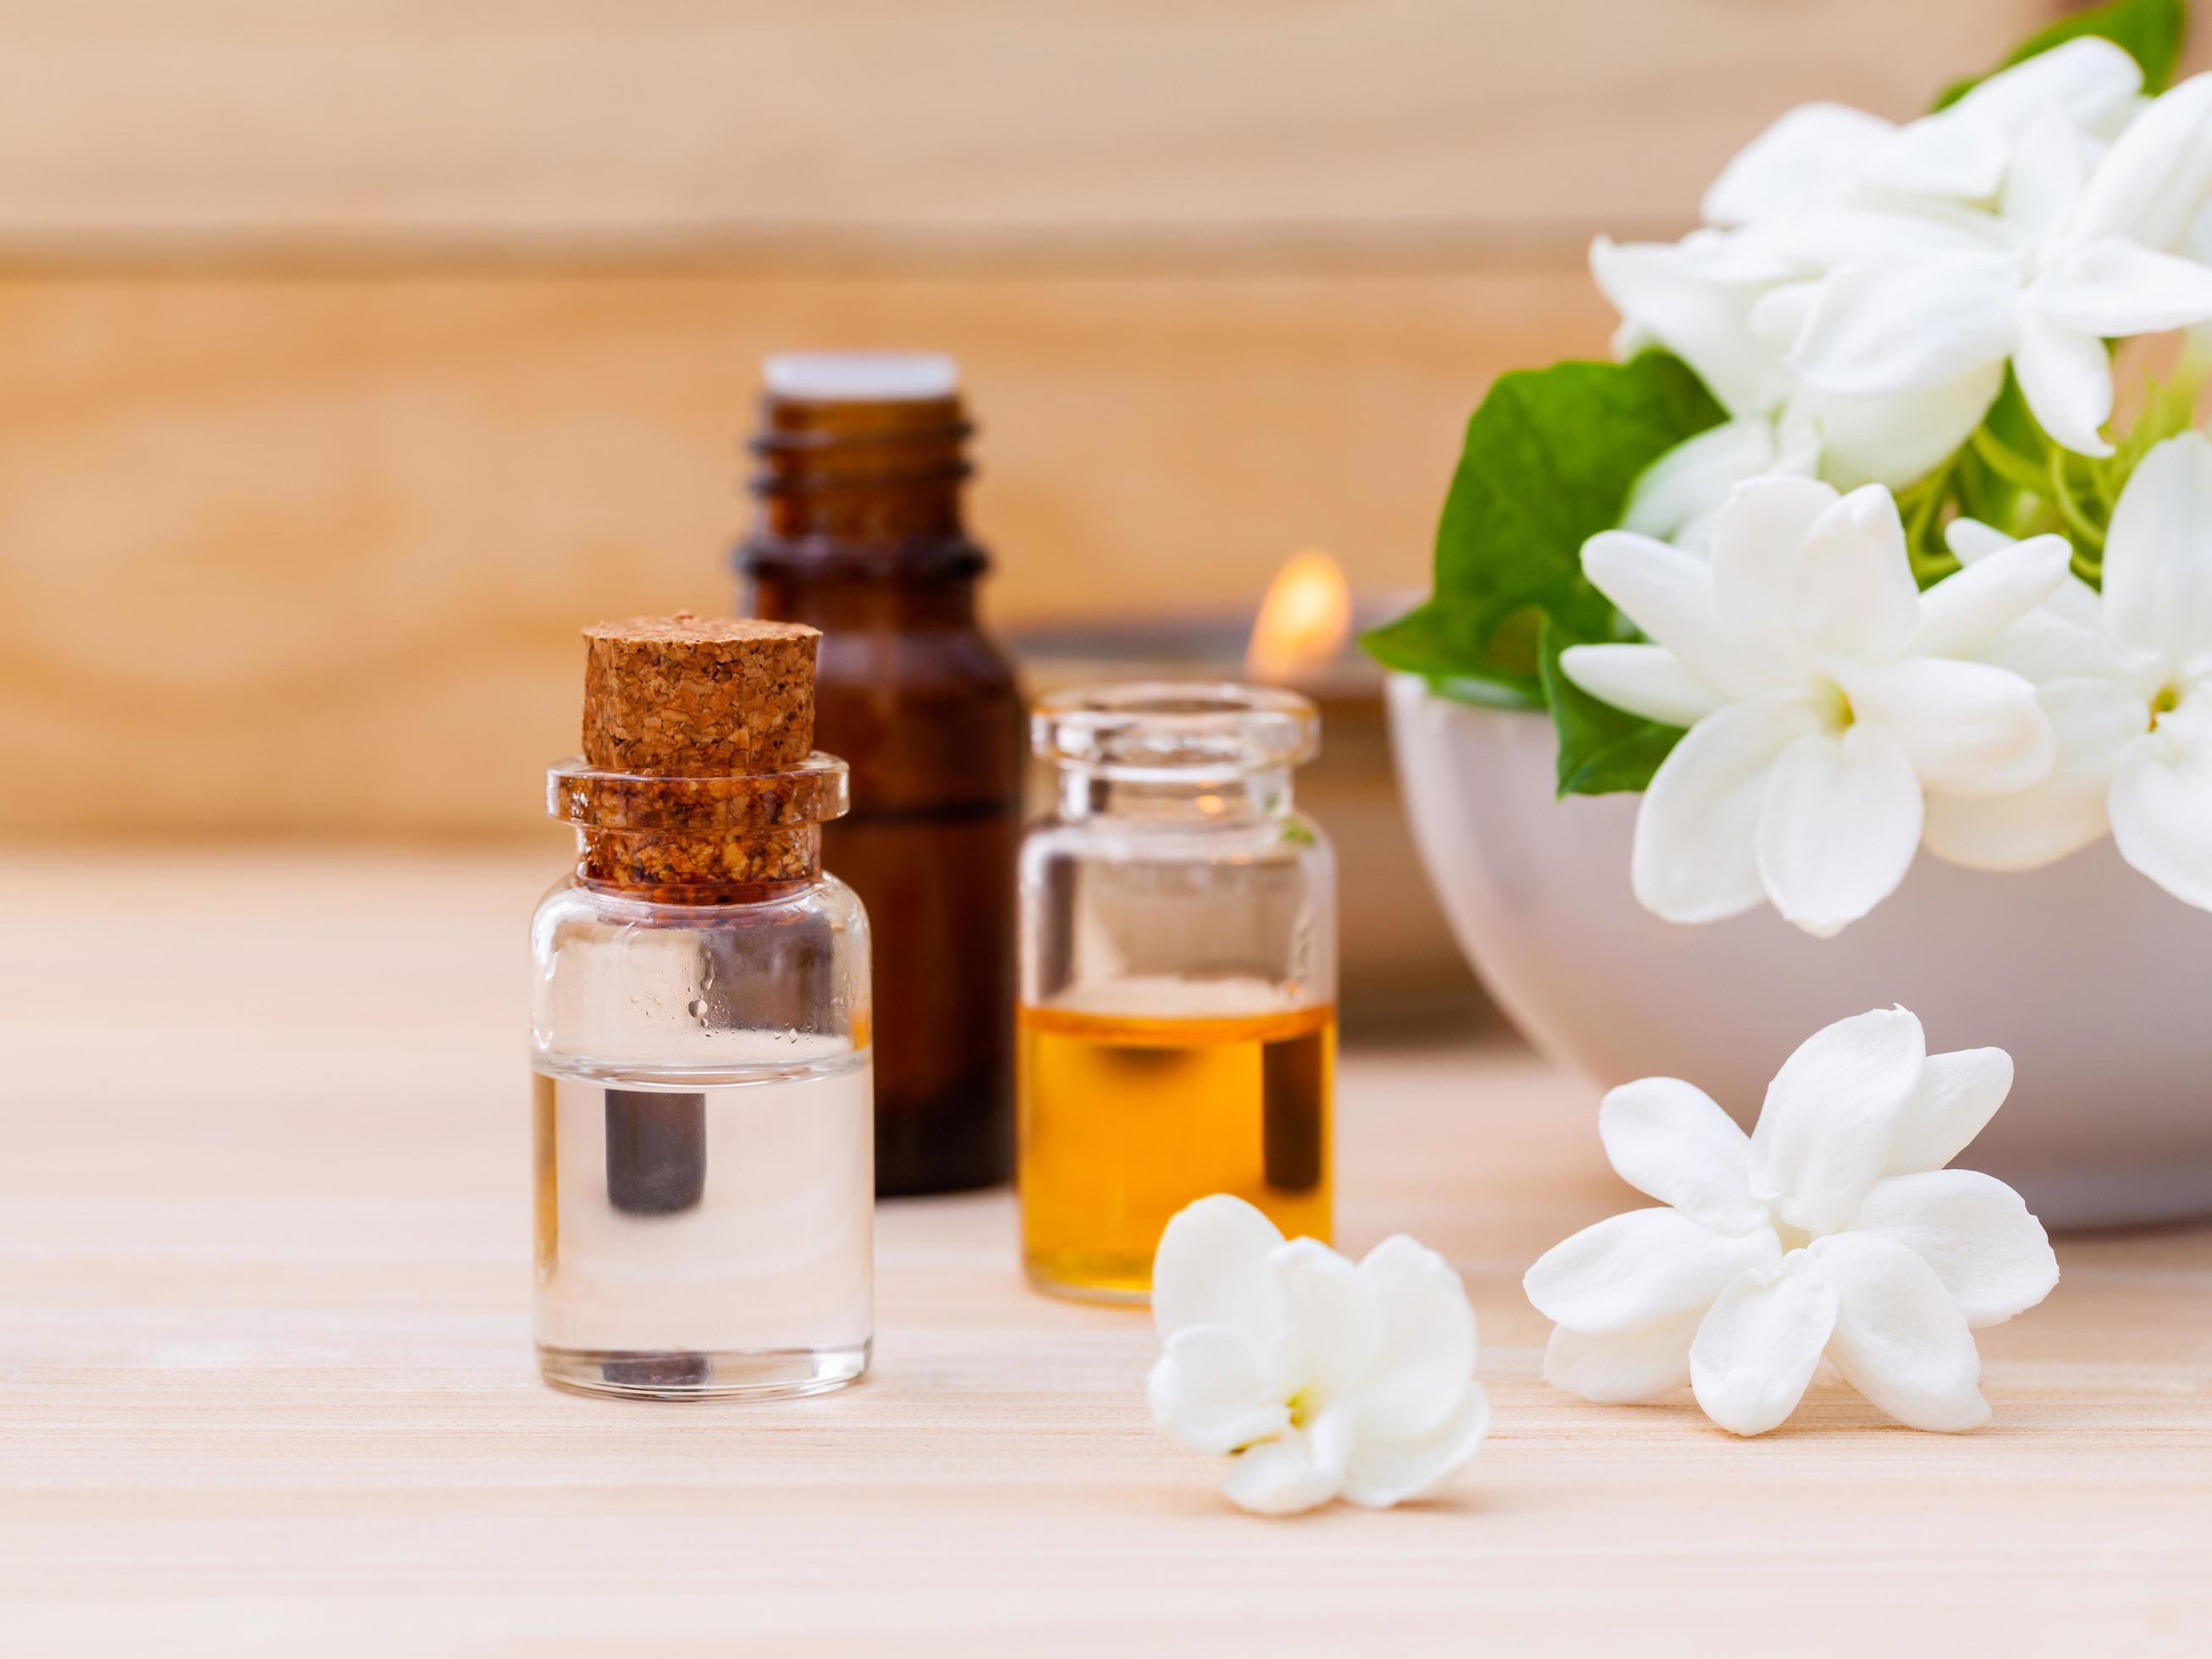 aroma-oil-bottles-arranged-with-jasmine-free-photo